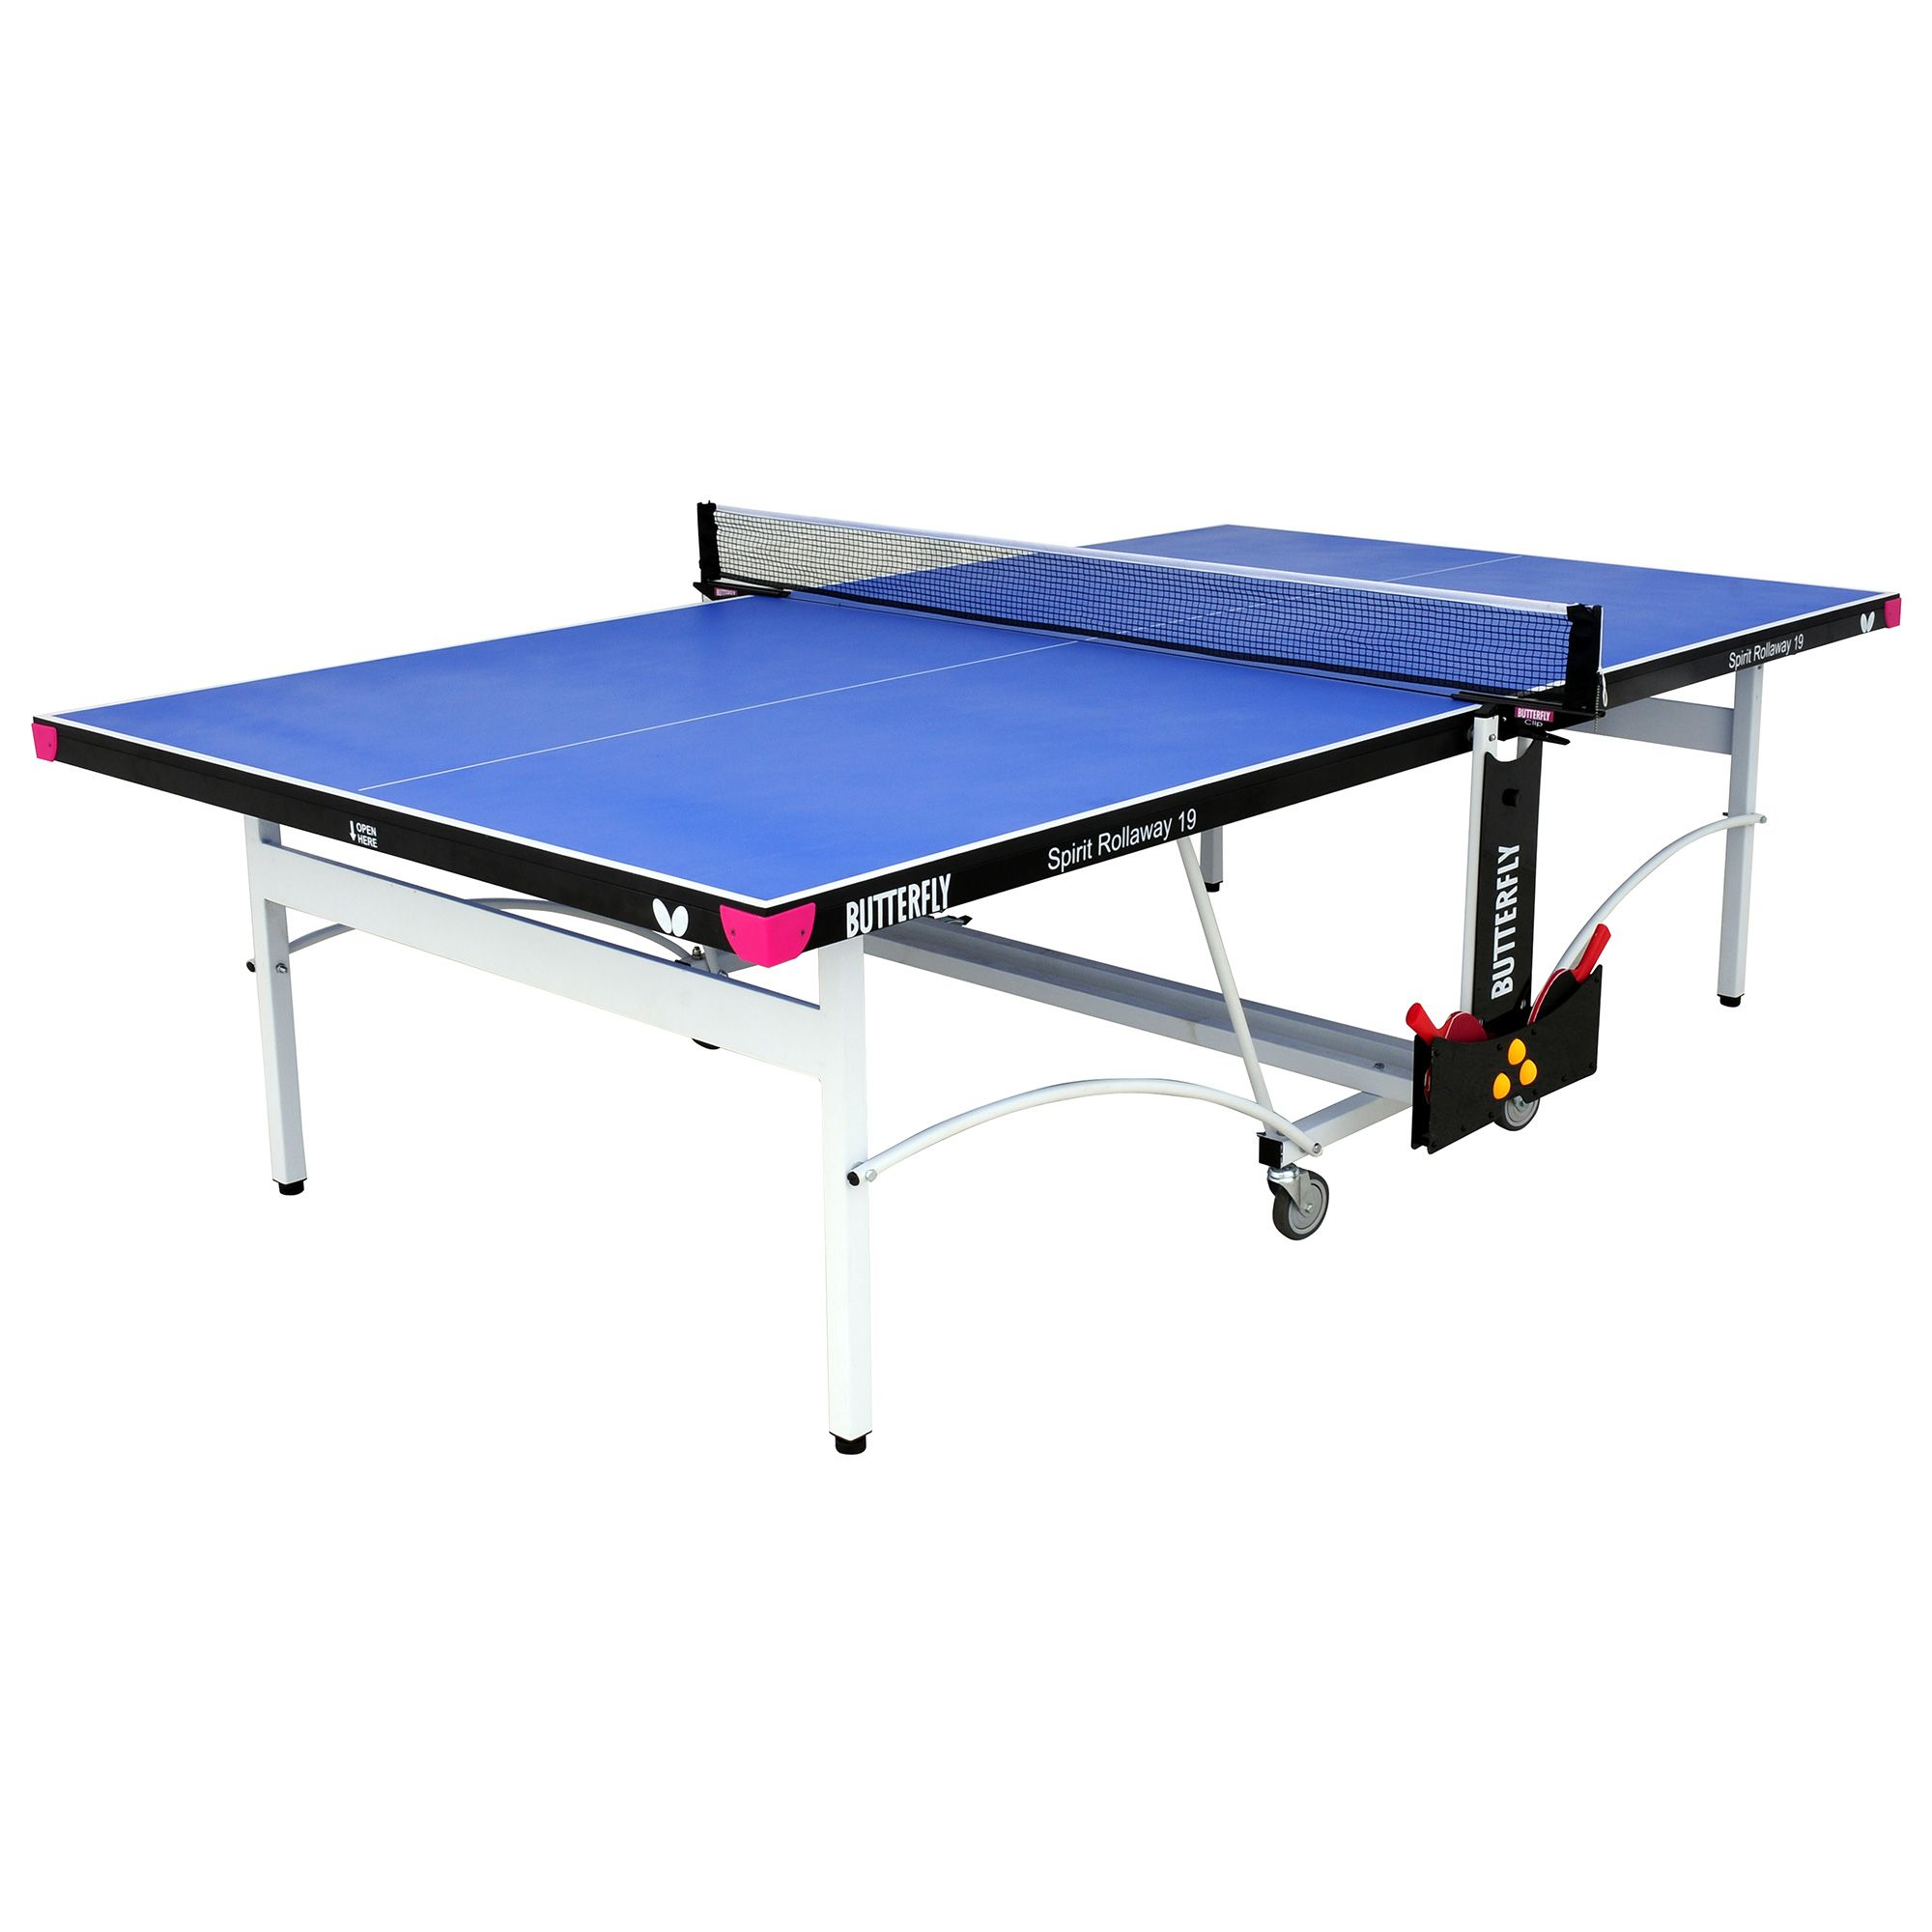 Butterfly Spirit 19 Rollaway Indoor Table Tennis Table